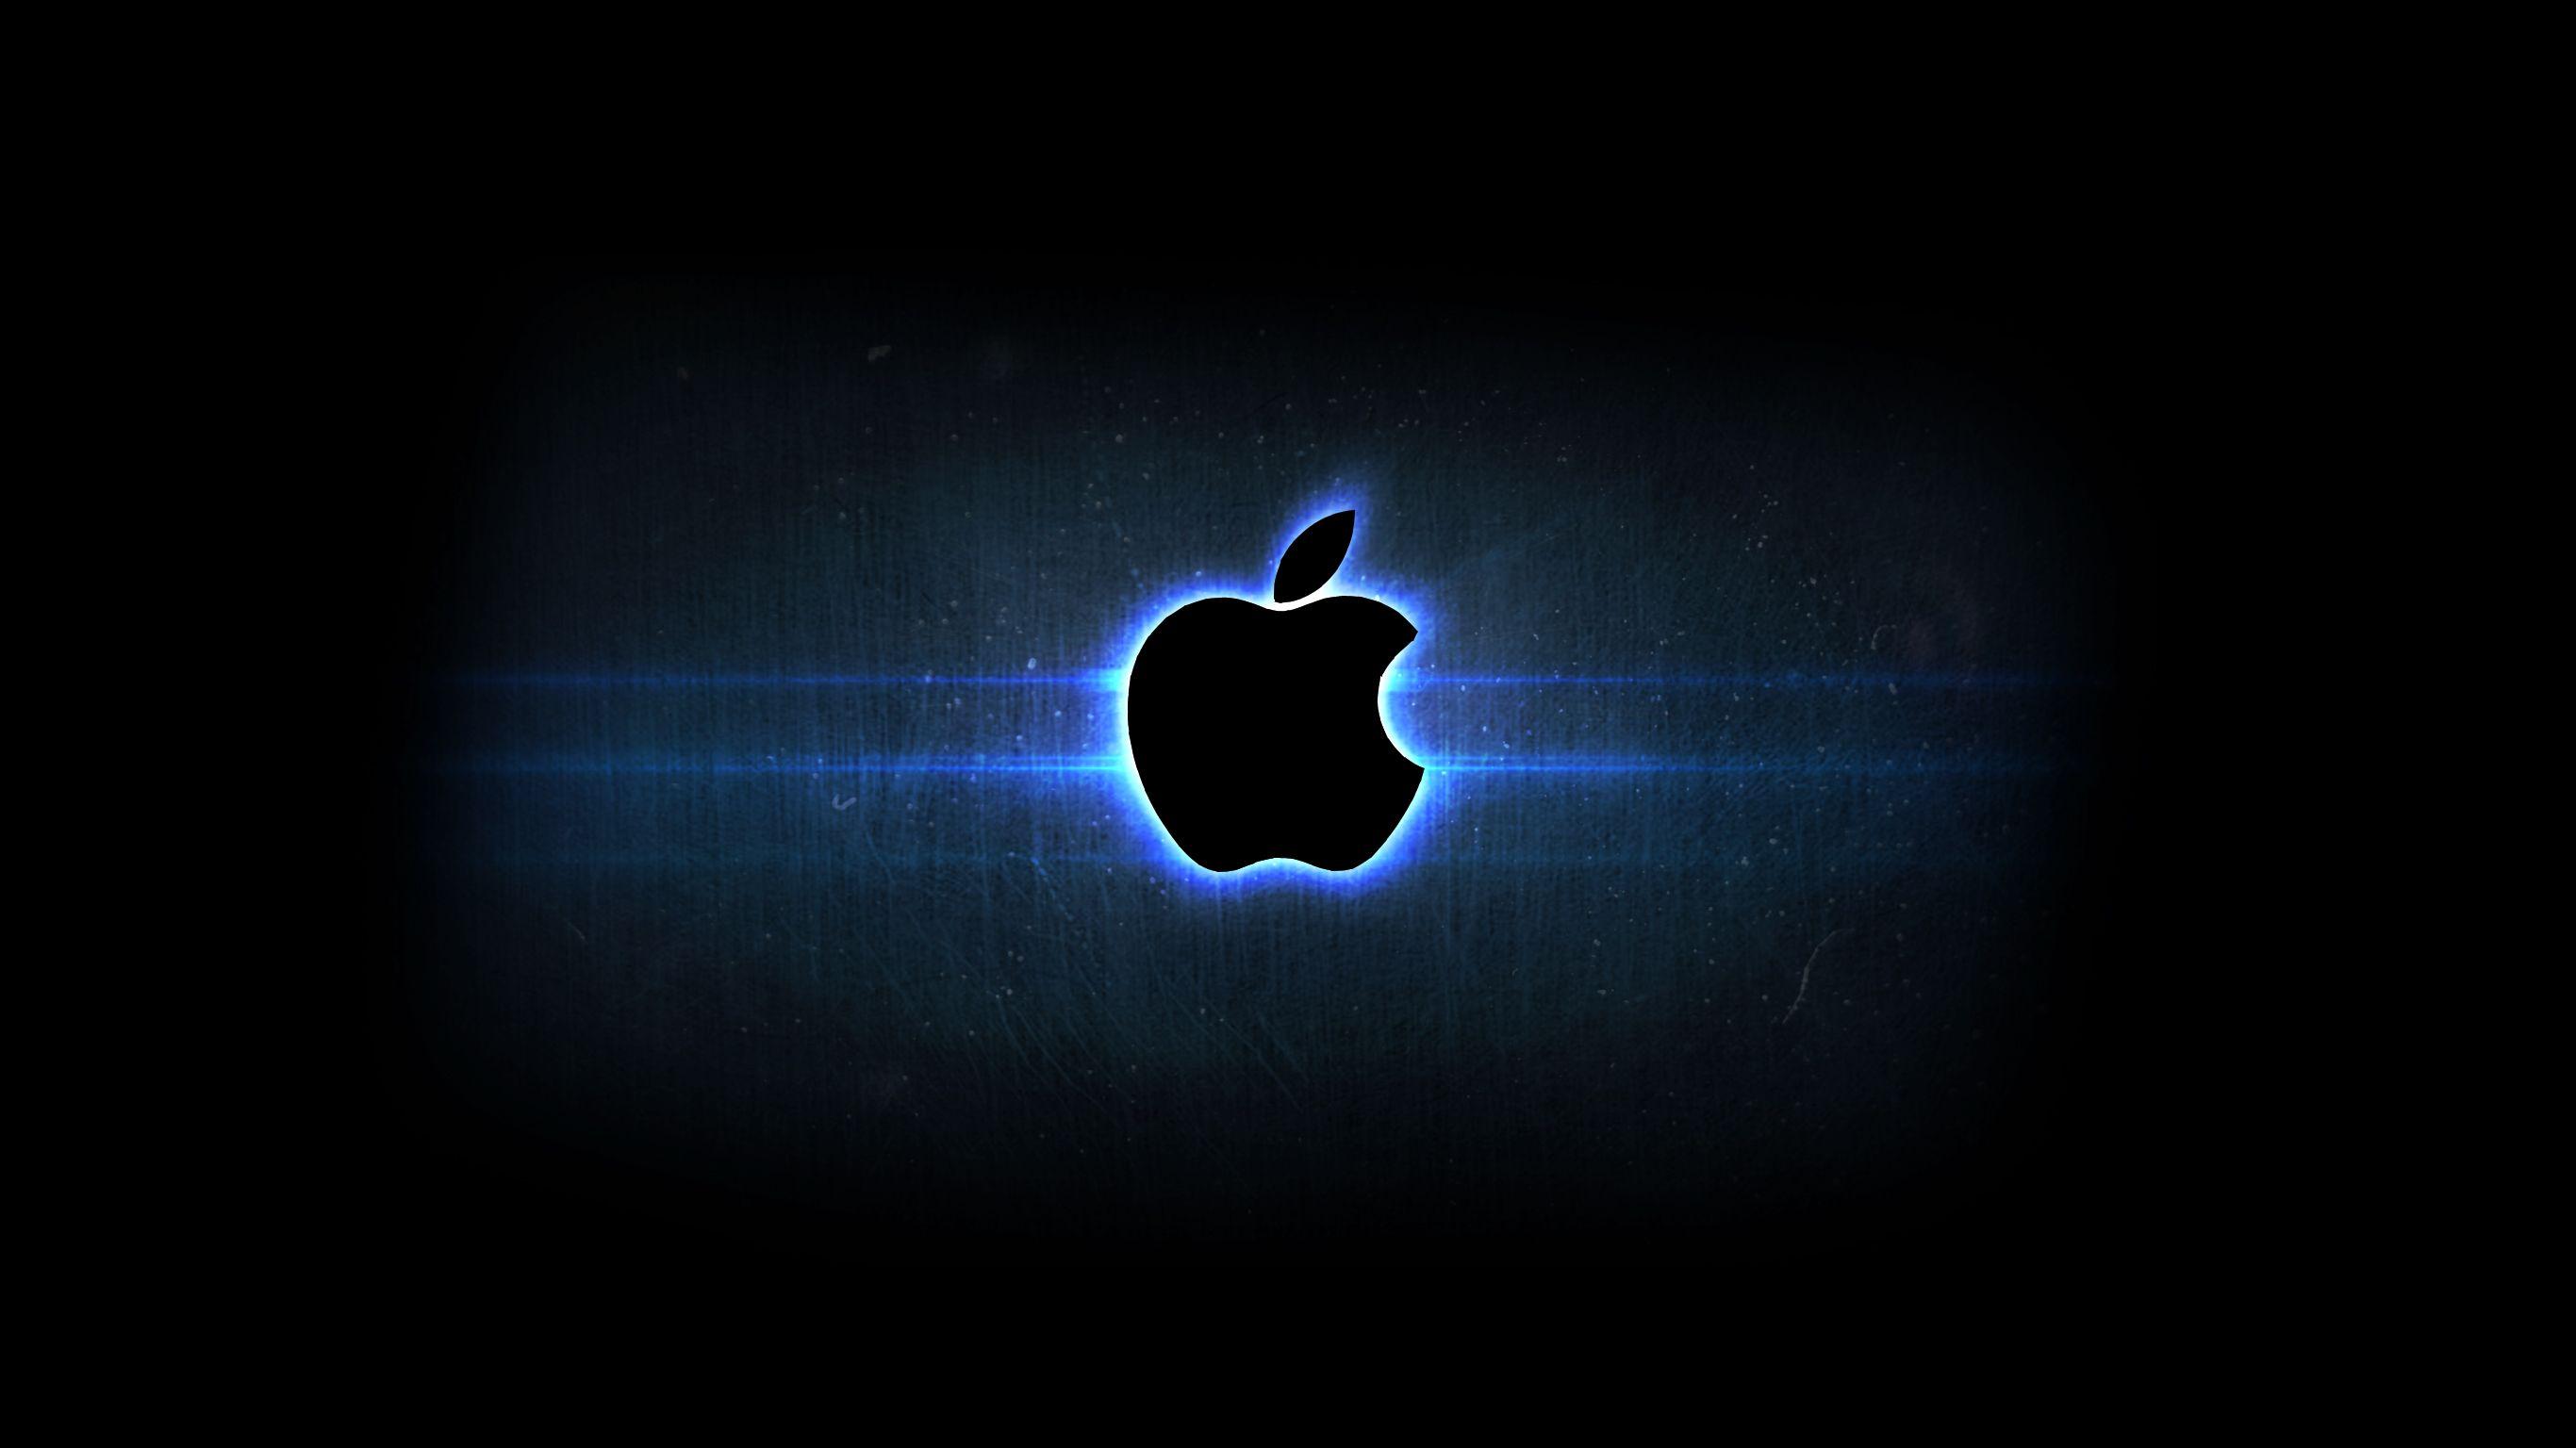 Black Apple Logo Wallpapers HD Wallpaper Apple logo